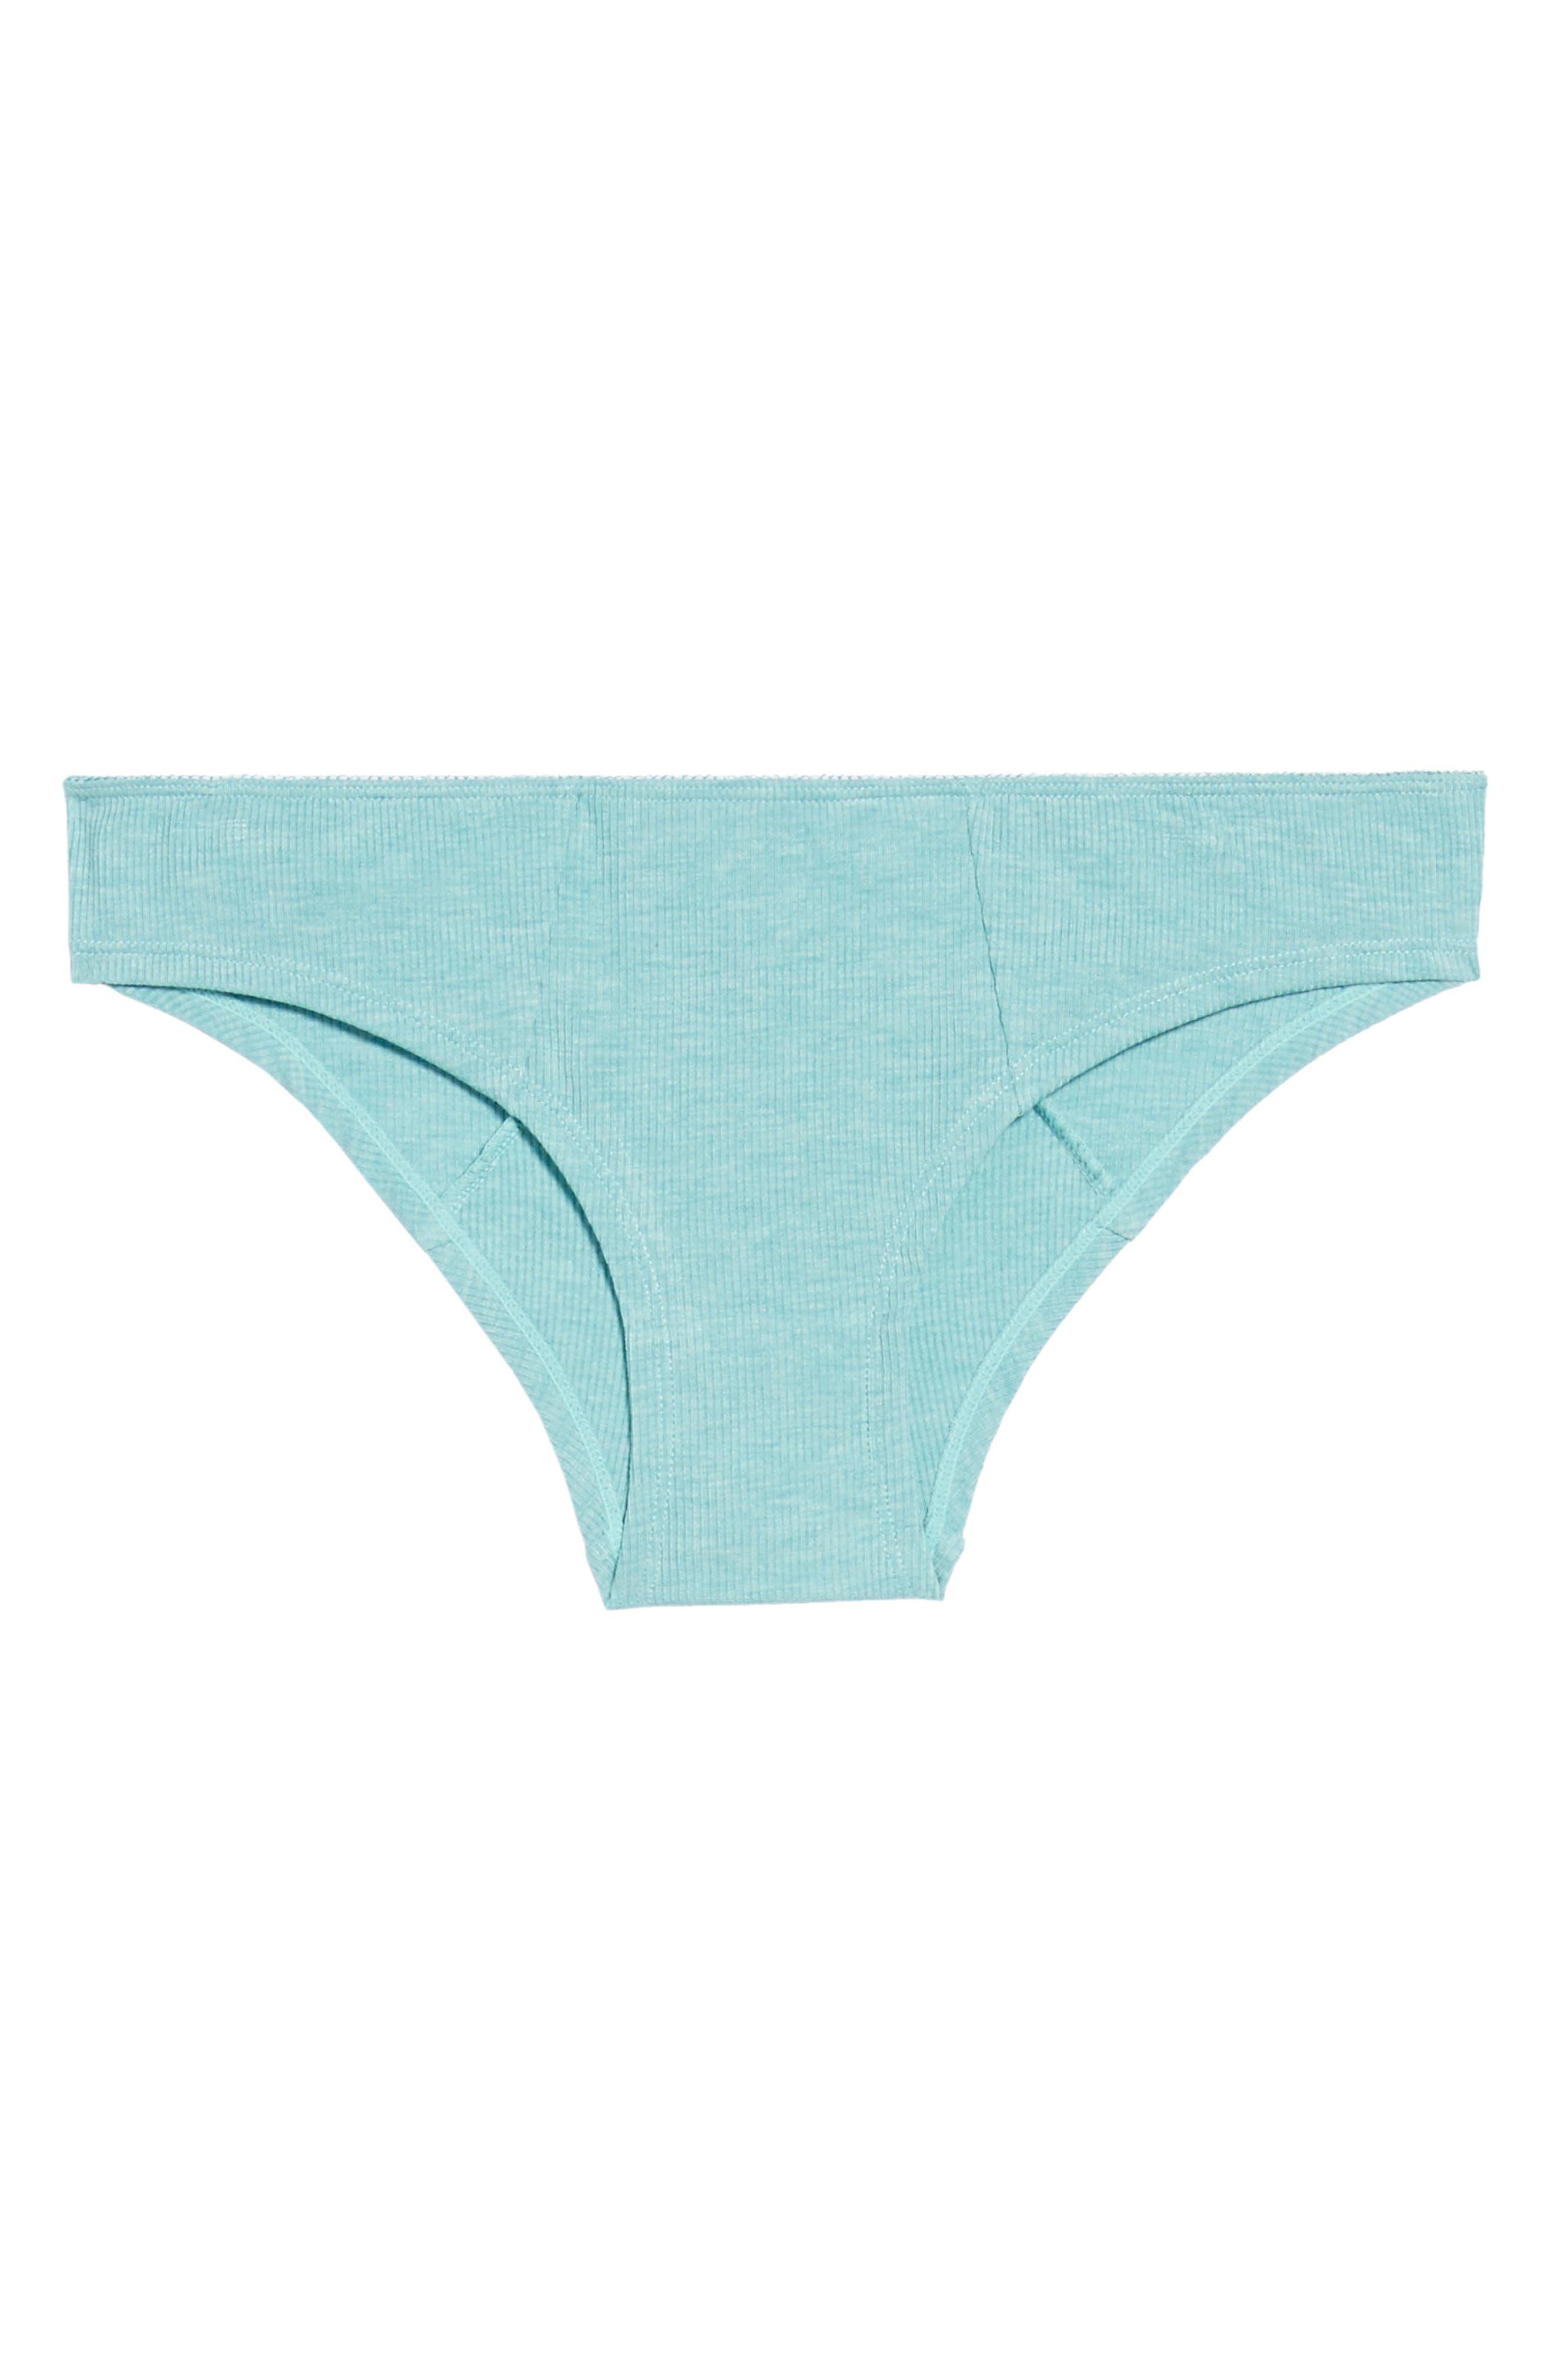 Rib Knit Bikini,                             Alternate thumbnail 6, color,                             Prickly Pear